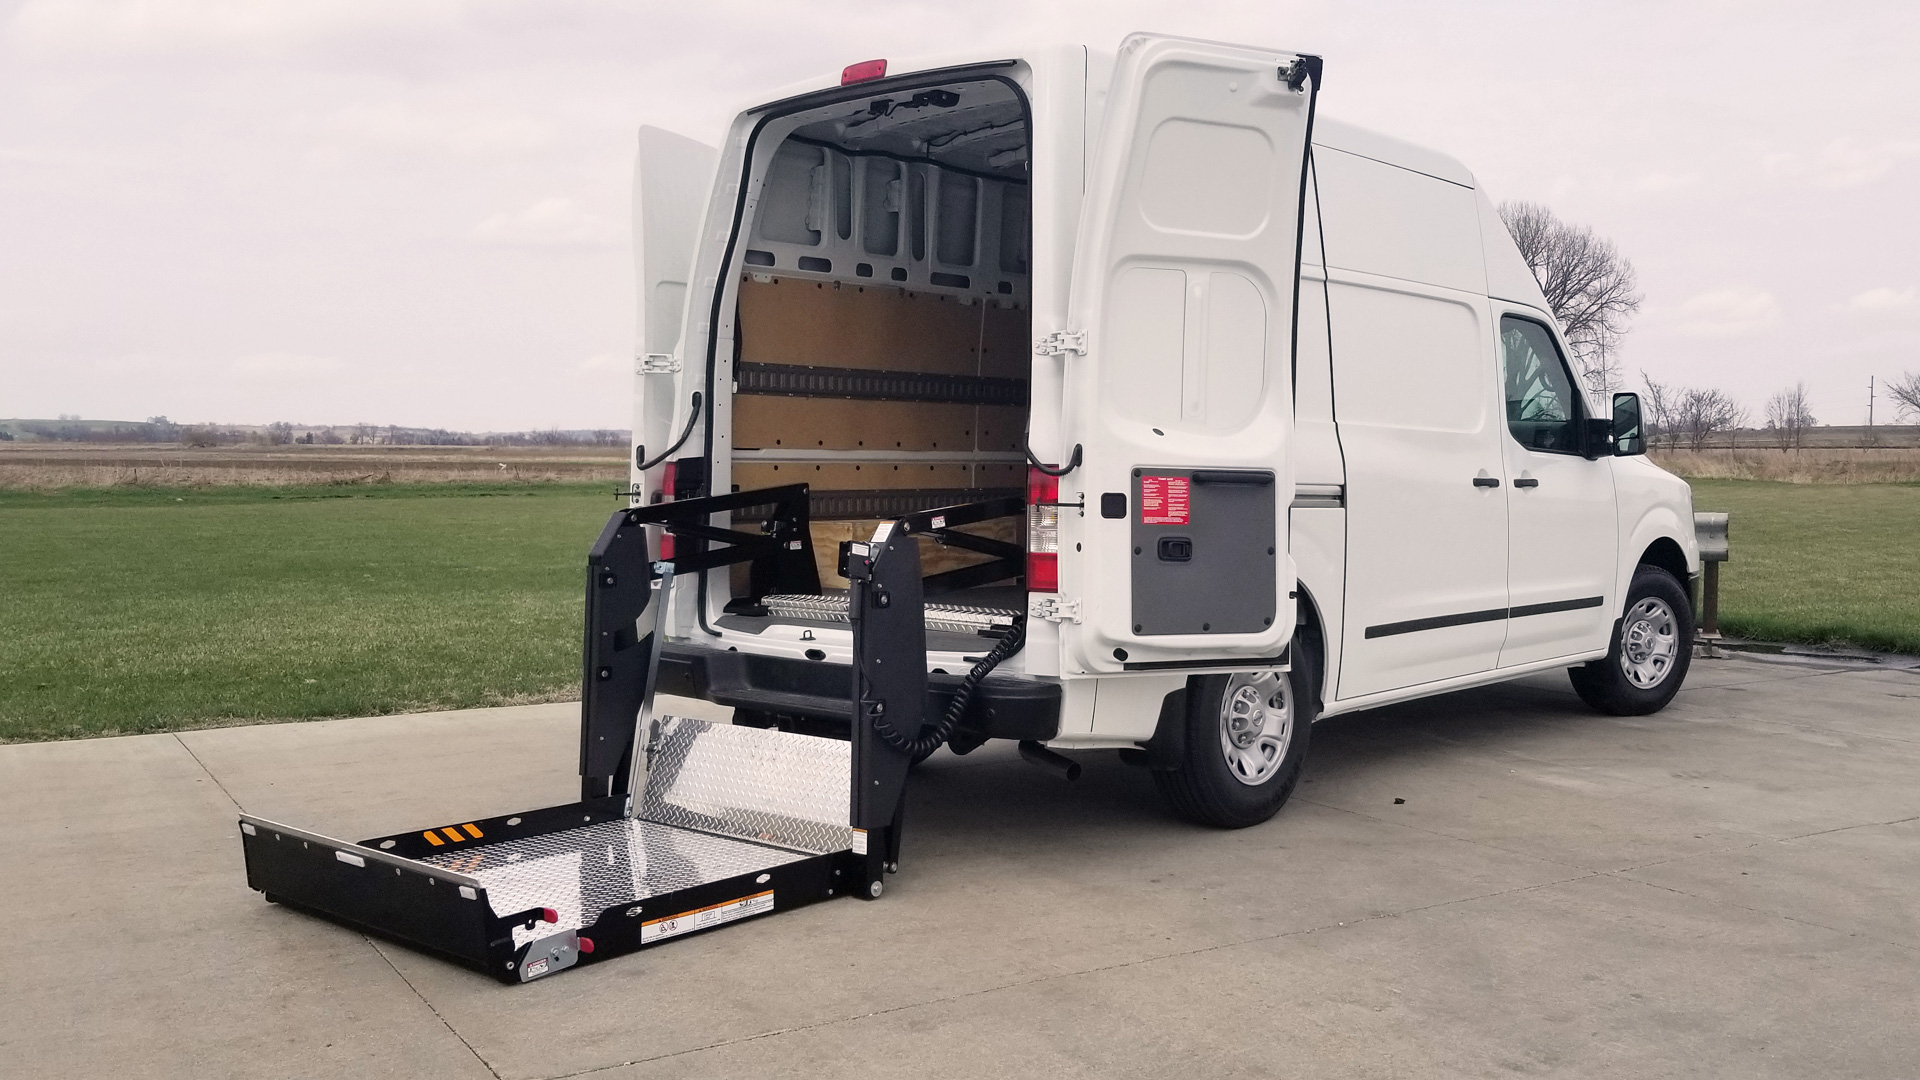 2017 Ram Promaster Cargo Van Extended Cargo Van >> Tommy Gate - V2 Series